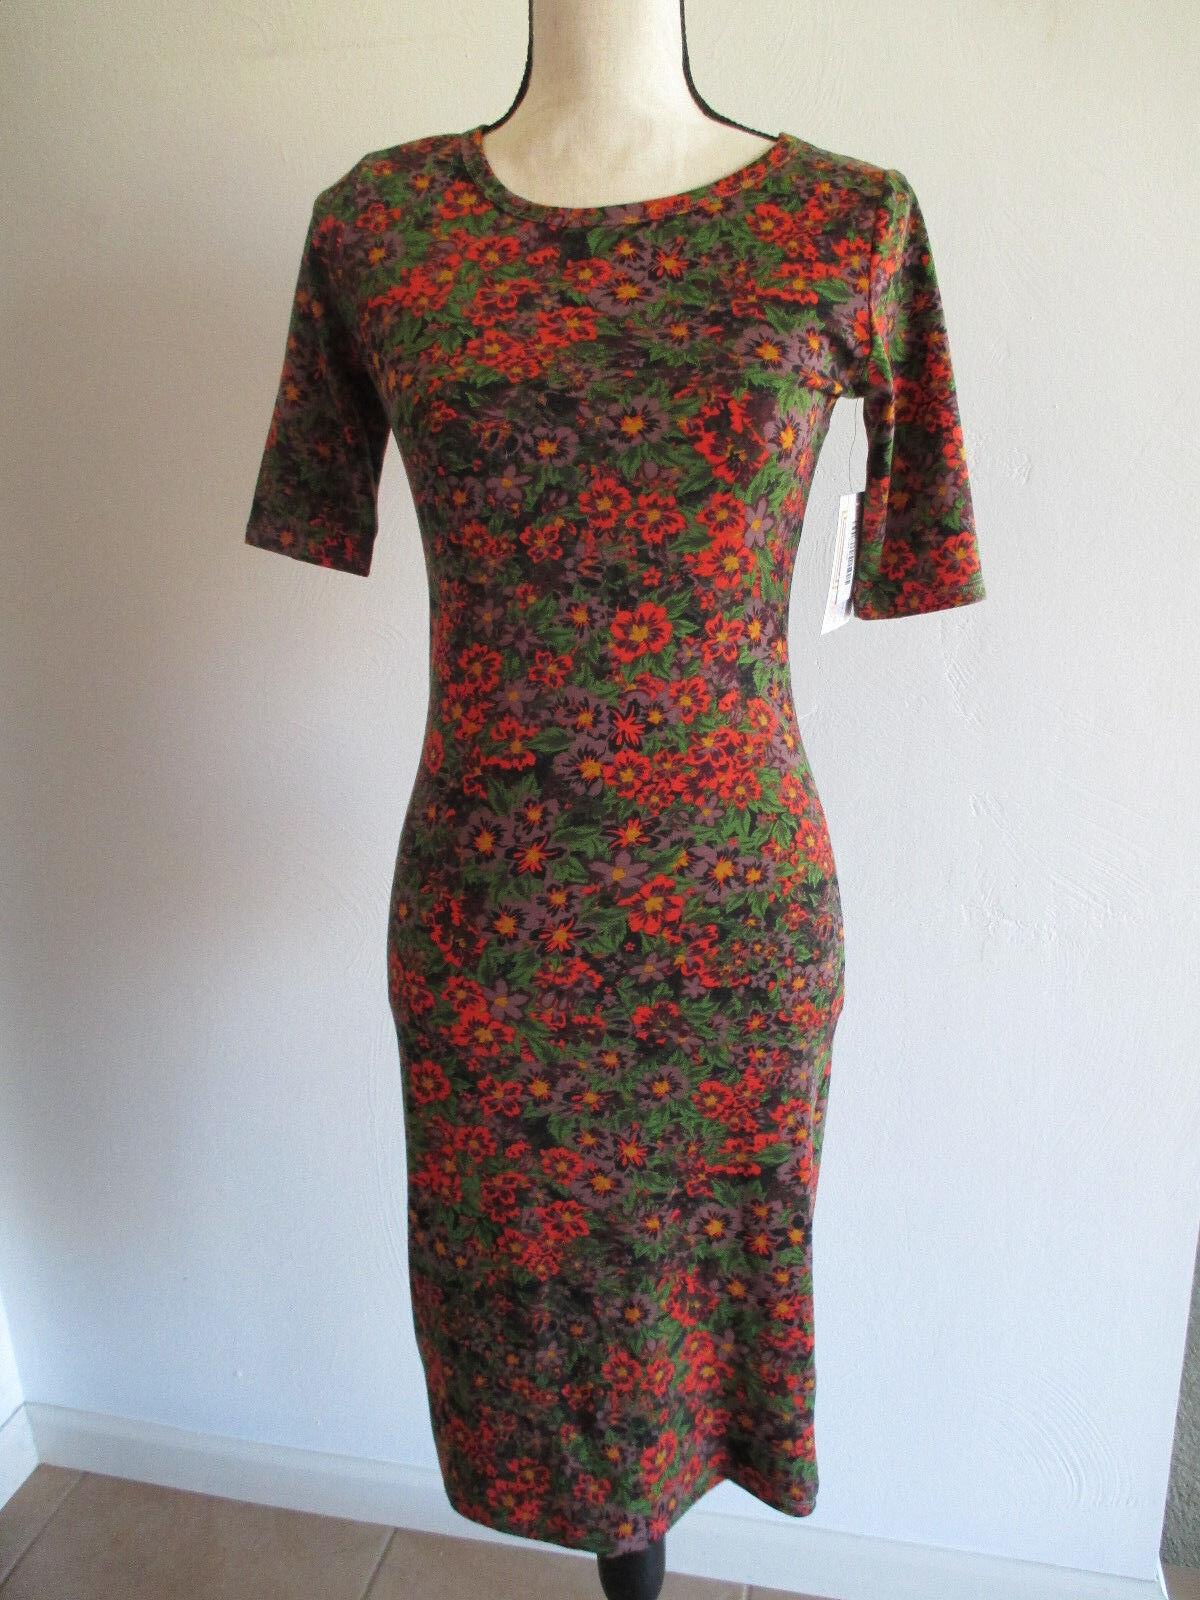 NWT Women s Julia Dress Autumn Fall Dress Sz XS orange Green Floral Lularoe  nrbubu931-Dresses 4c738bfa4